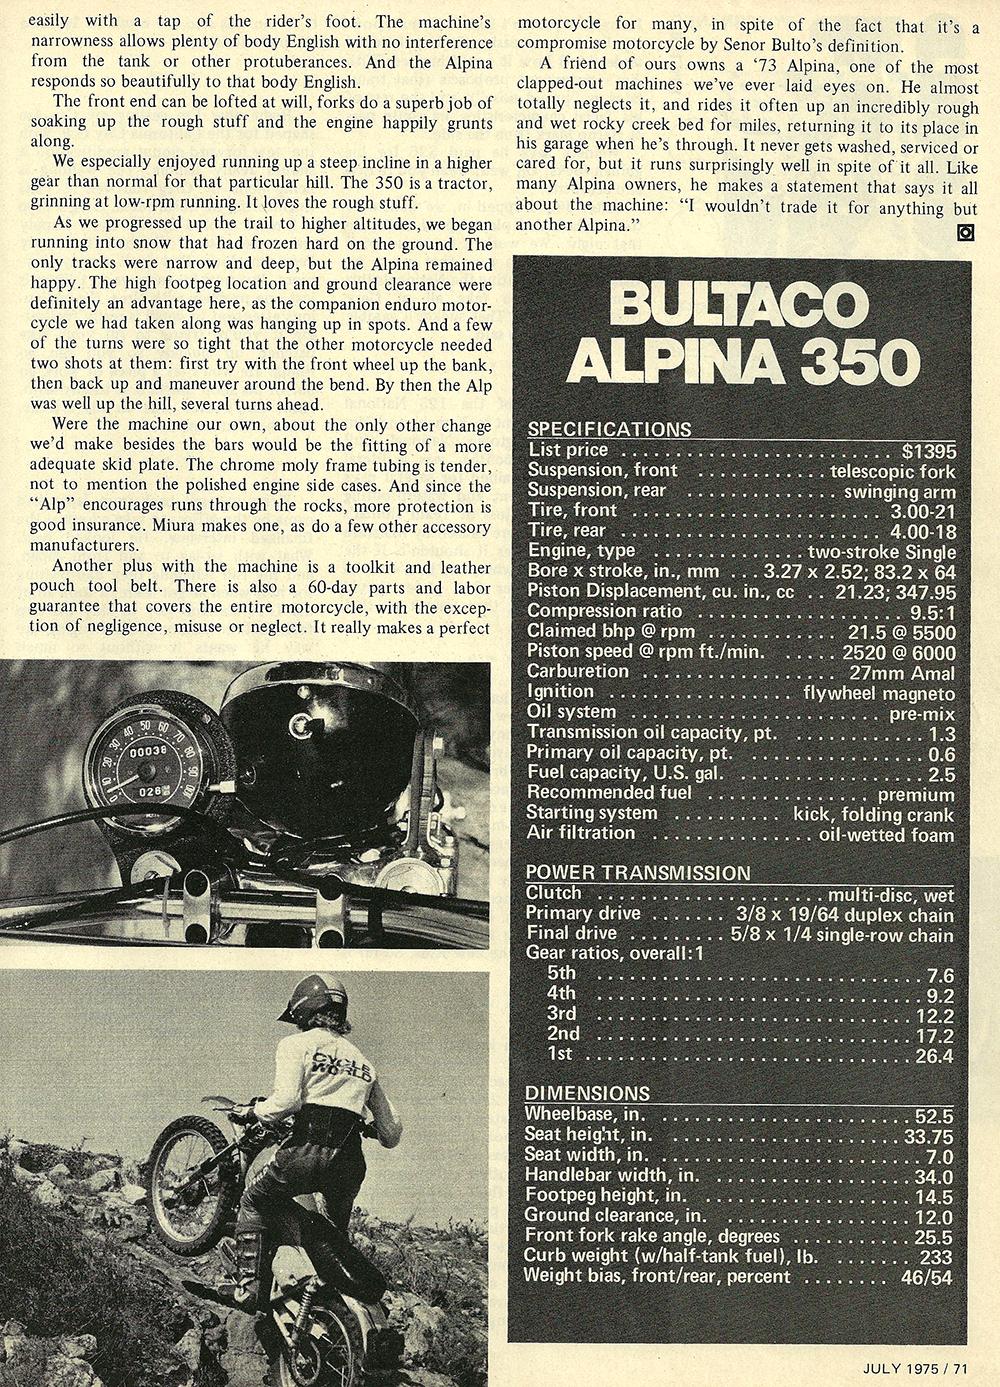 1975 Bultaco Alpina 350 road test 06.jpg